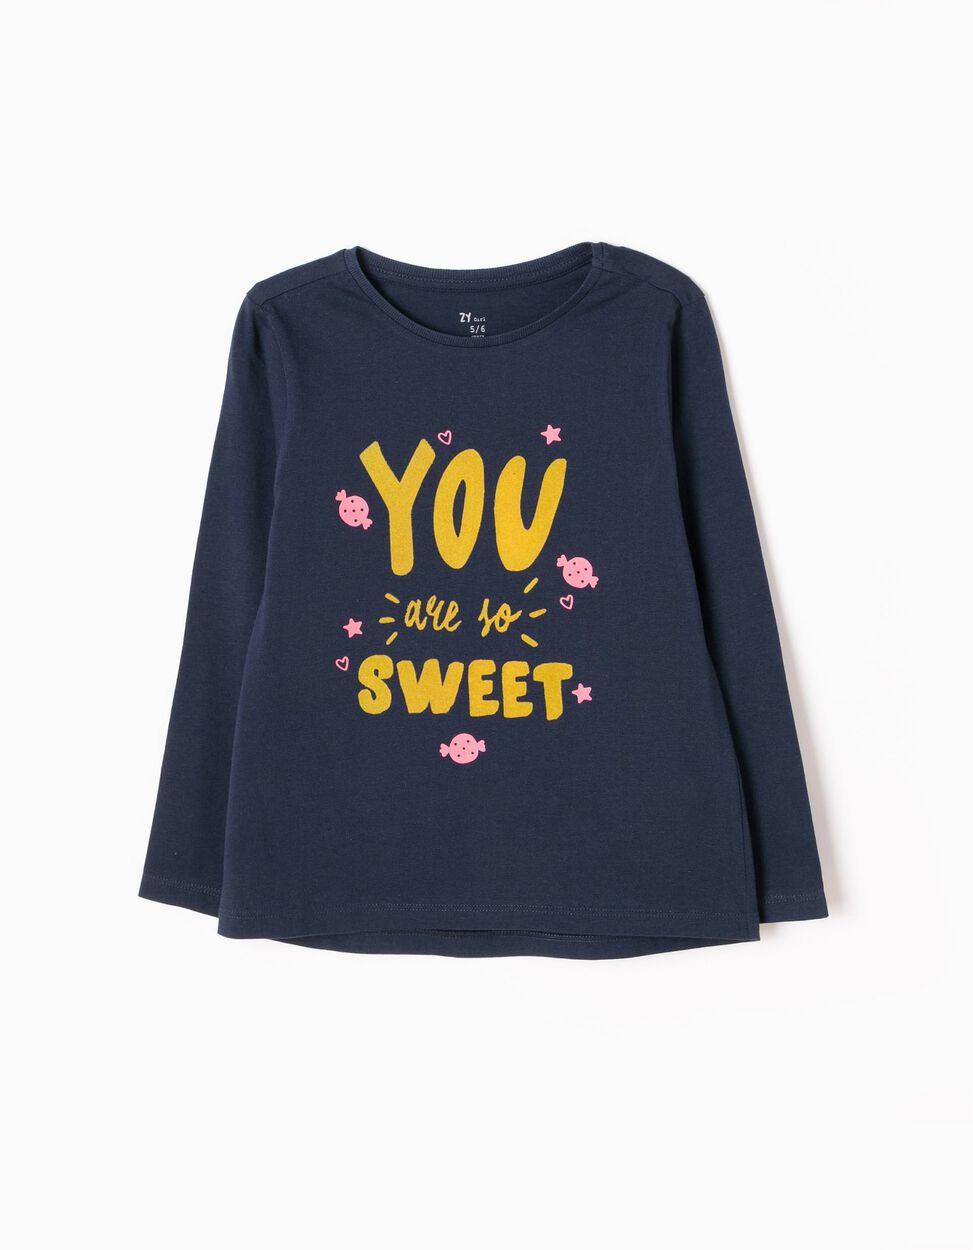 Camiseta de Manga Larga Sweet Azul